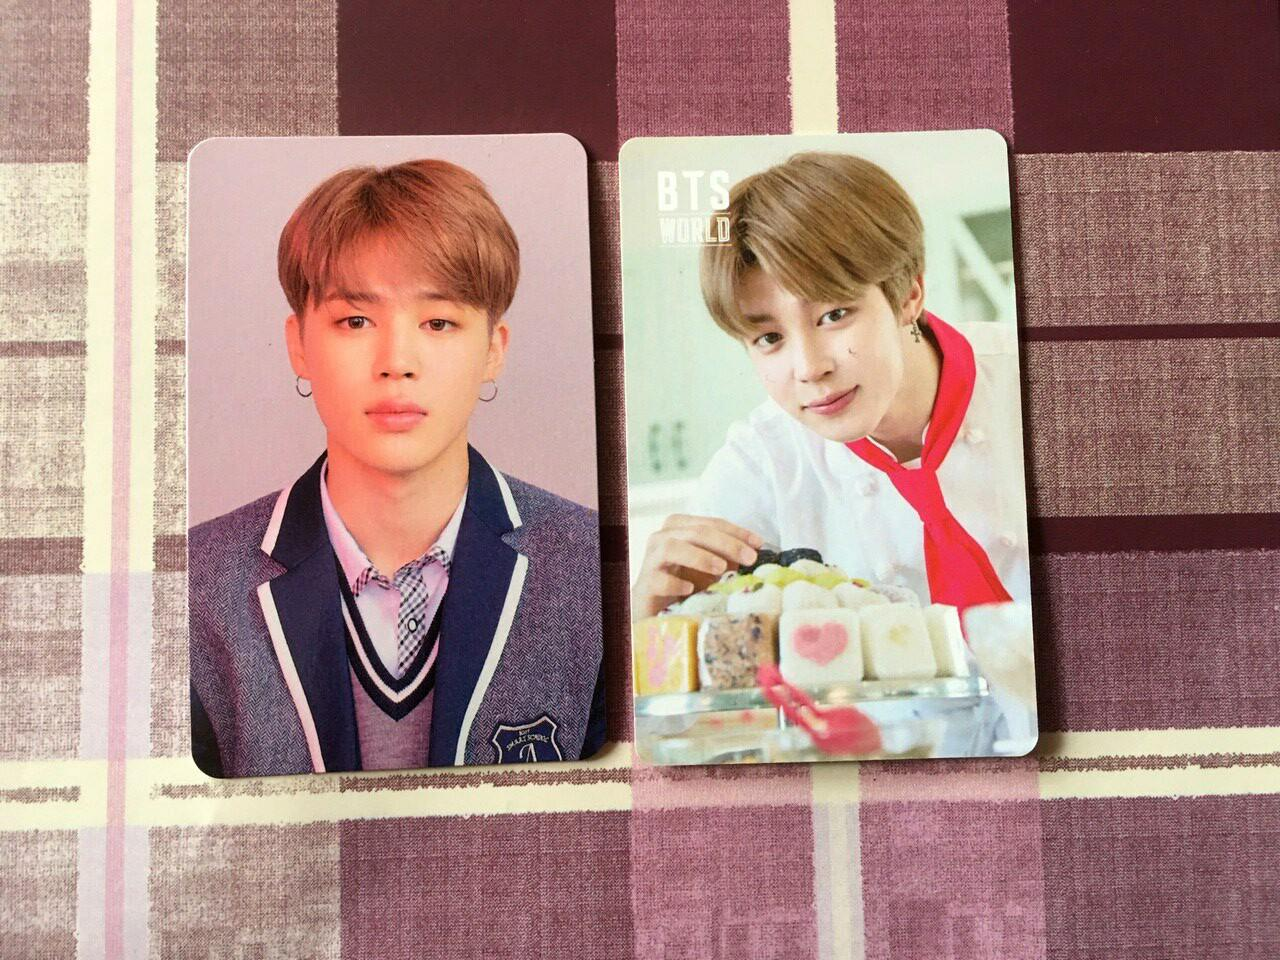 [WTS]BTS JIMIN BTS World & Love Yourself Answer Photocard